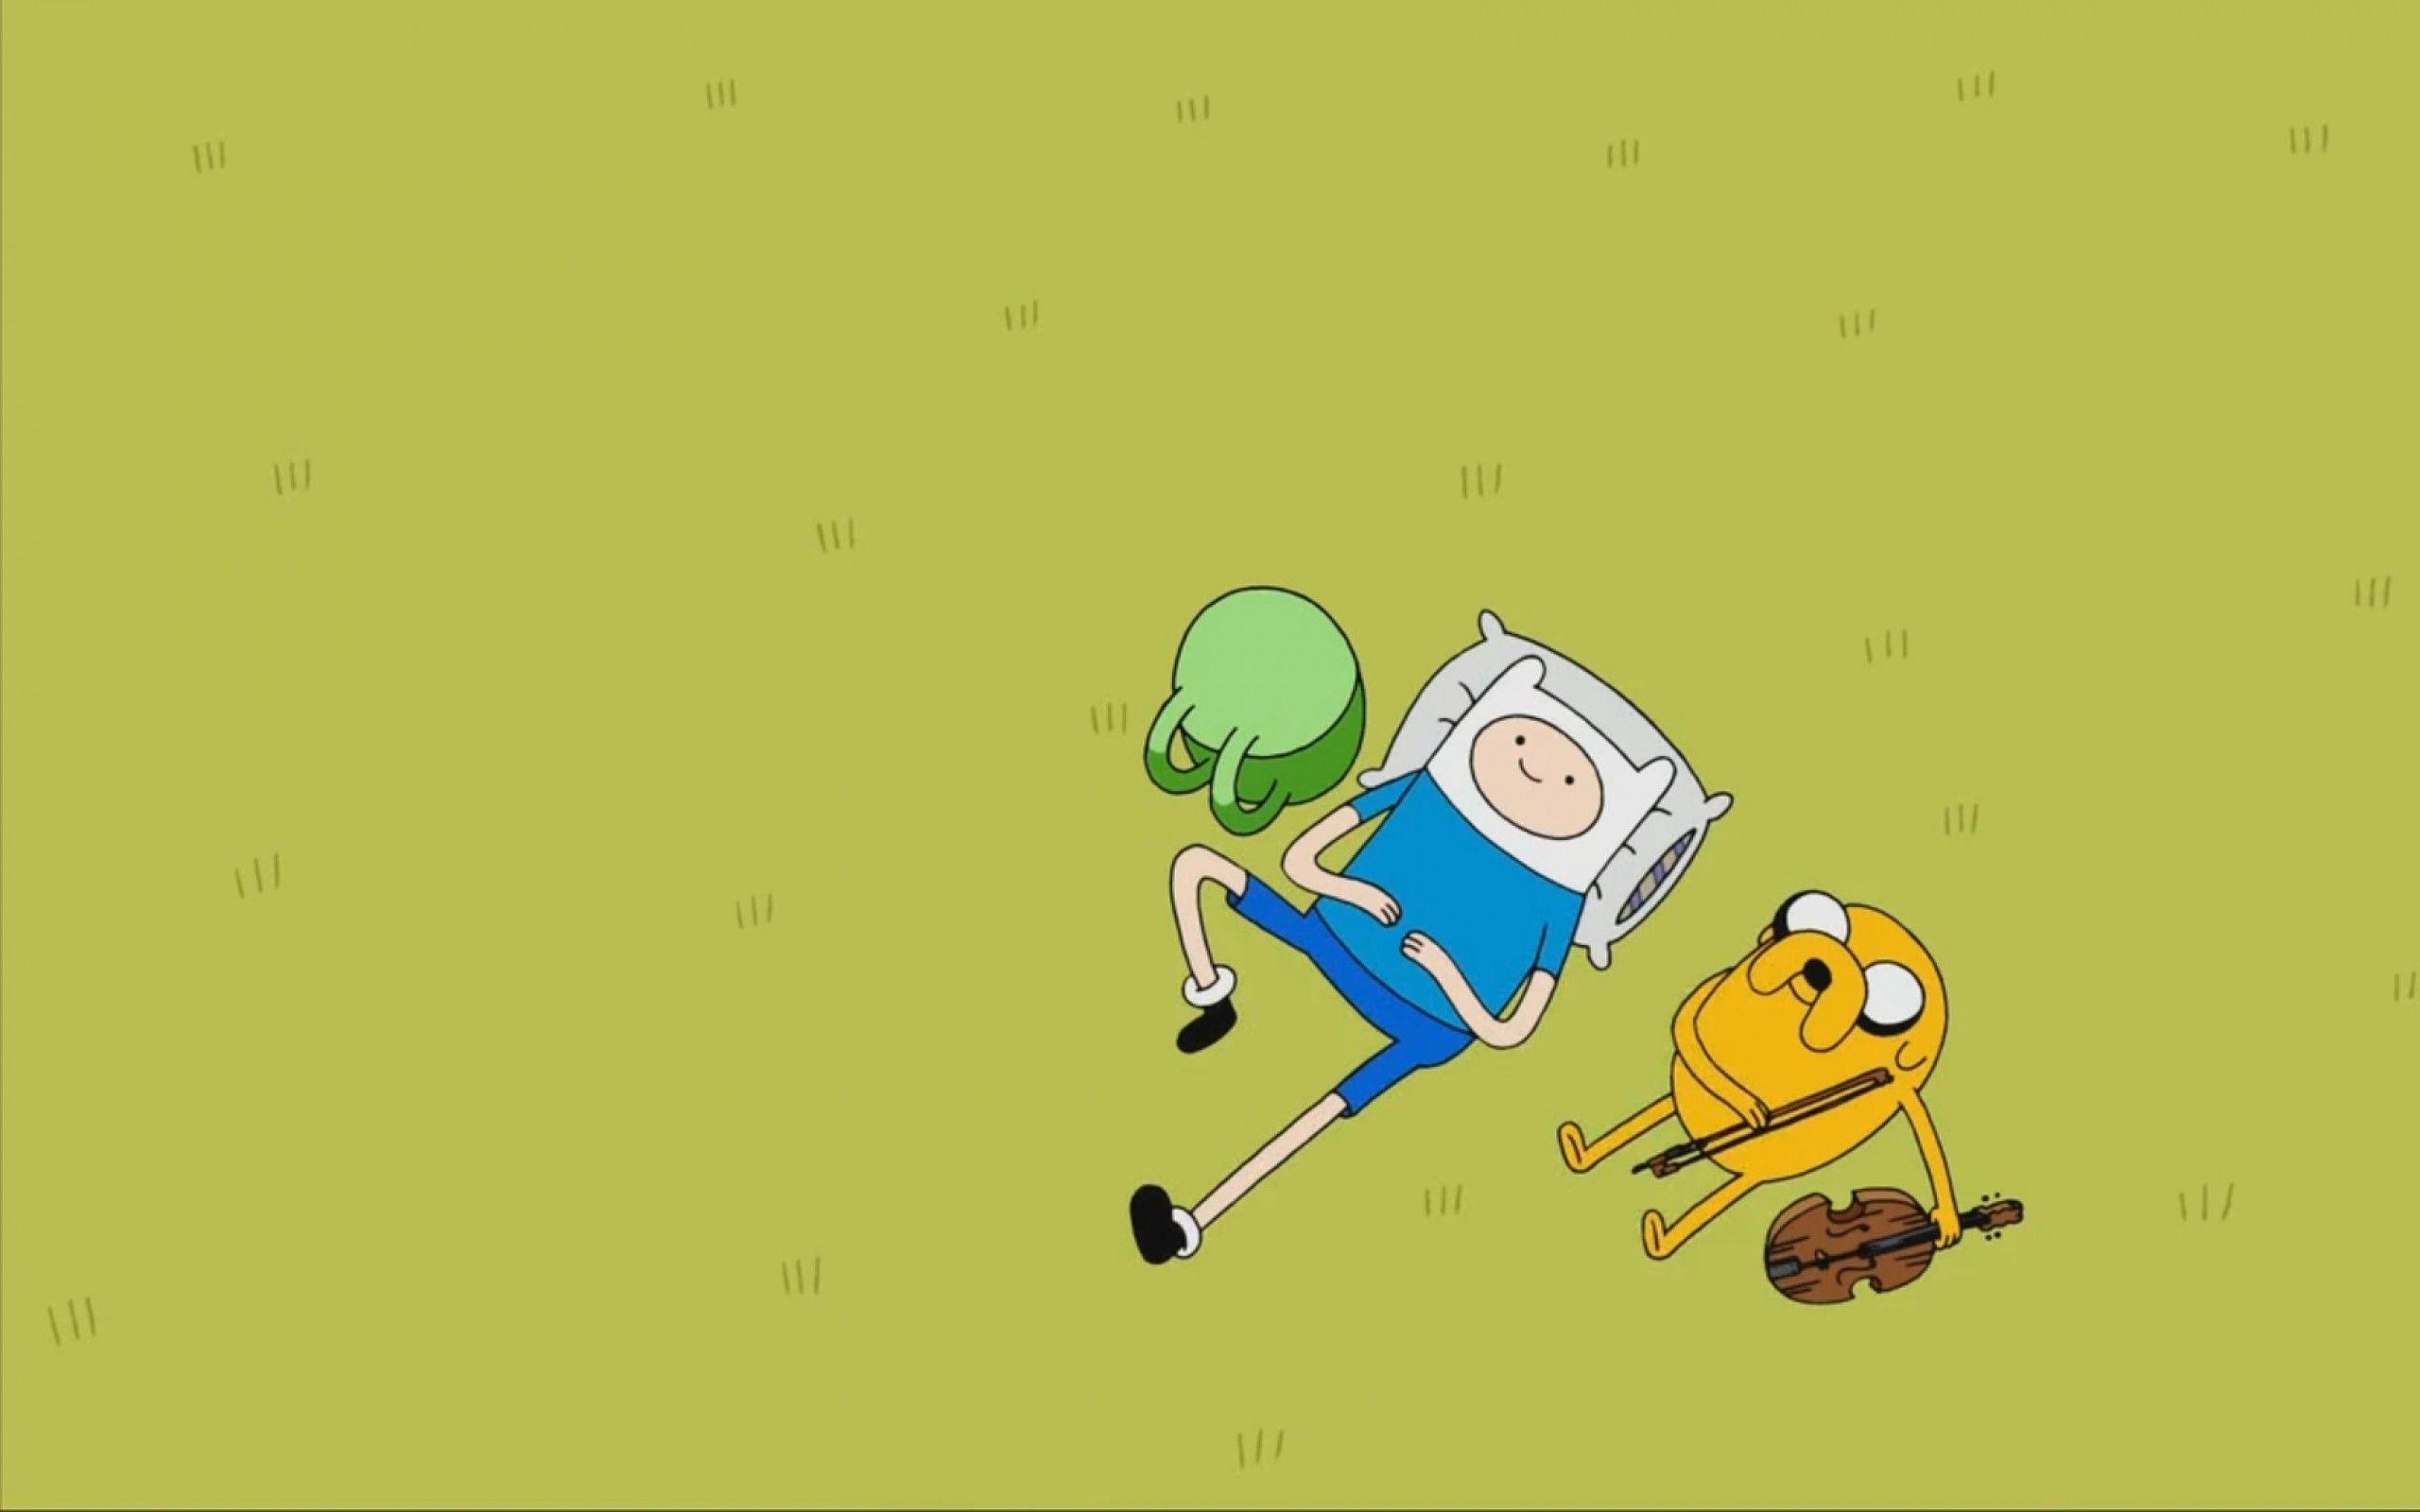 Adventure Time Wallpapers HD Wallpaper   Wallpapers For Desktop ...